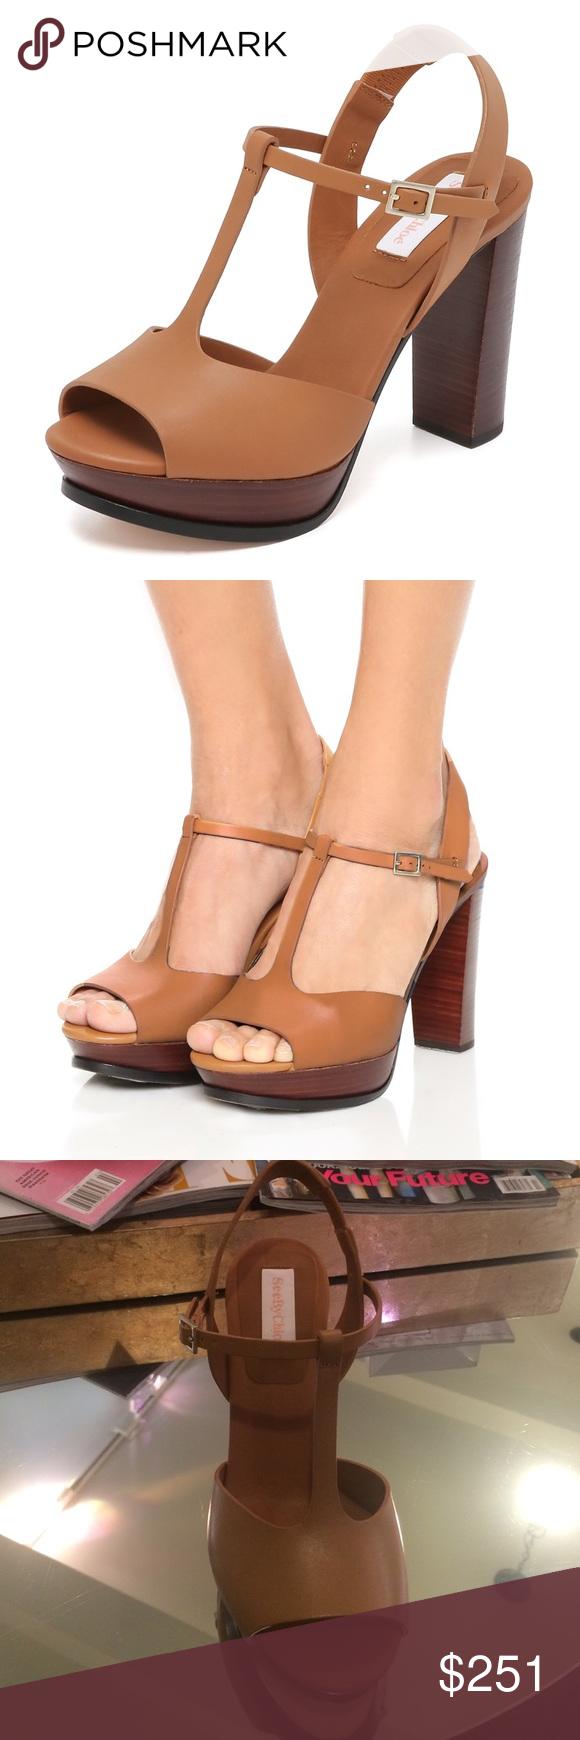 568c415a4147 See by Chloe Alex platform Brown leather see by Chloe t strap platforms.  One once platform with 3 1 2 inch heal See by Chloe Shoes Heels